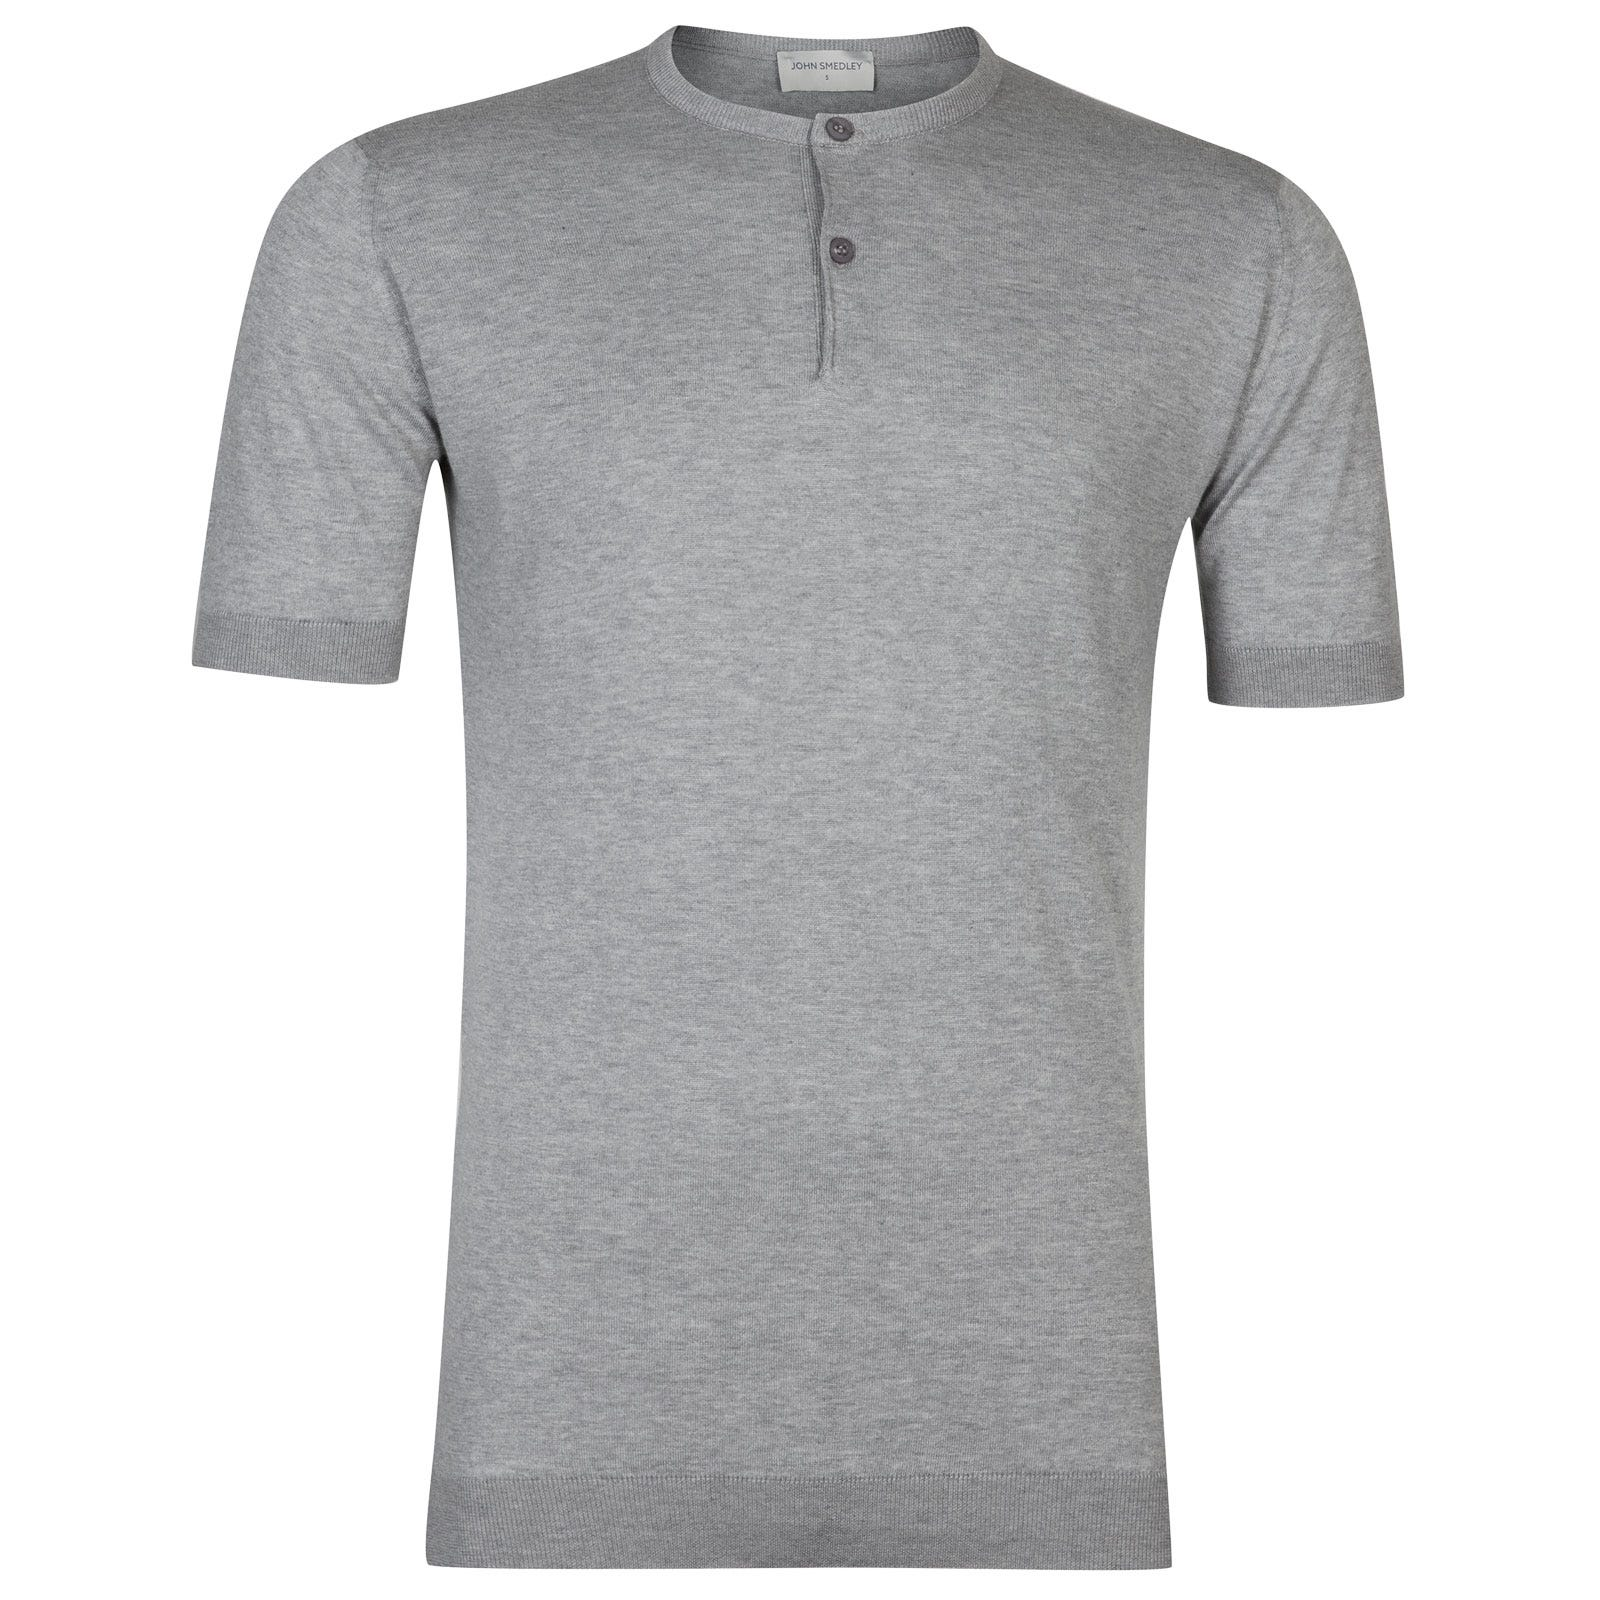 John Smedley Bennett Sea Island Cotton T-shirt in Silver-L